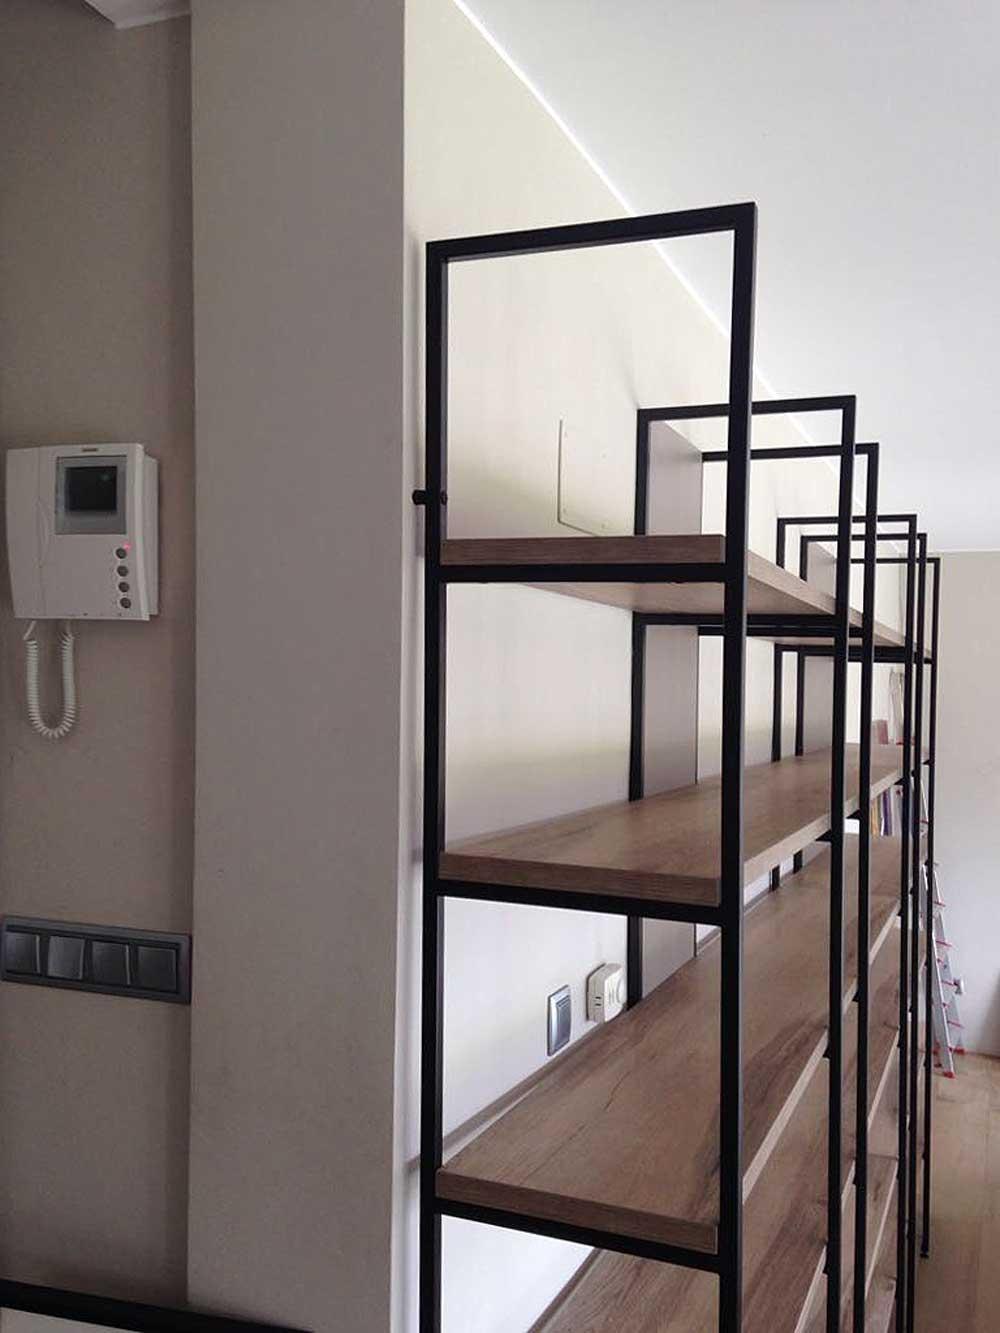 Cristina font proyecta apartamento con estanteria olut olut - Estanterias metalicas para casa ...